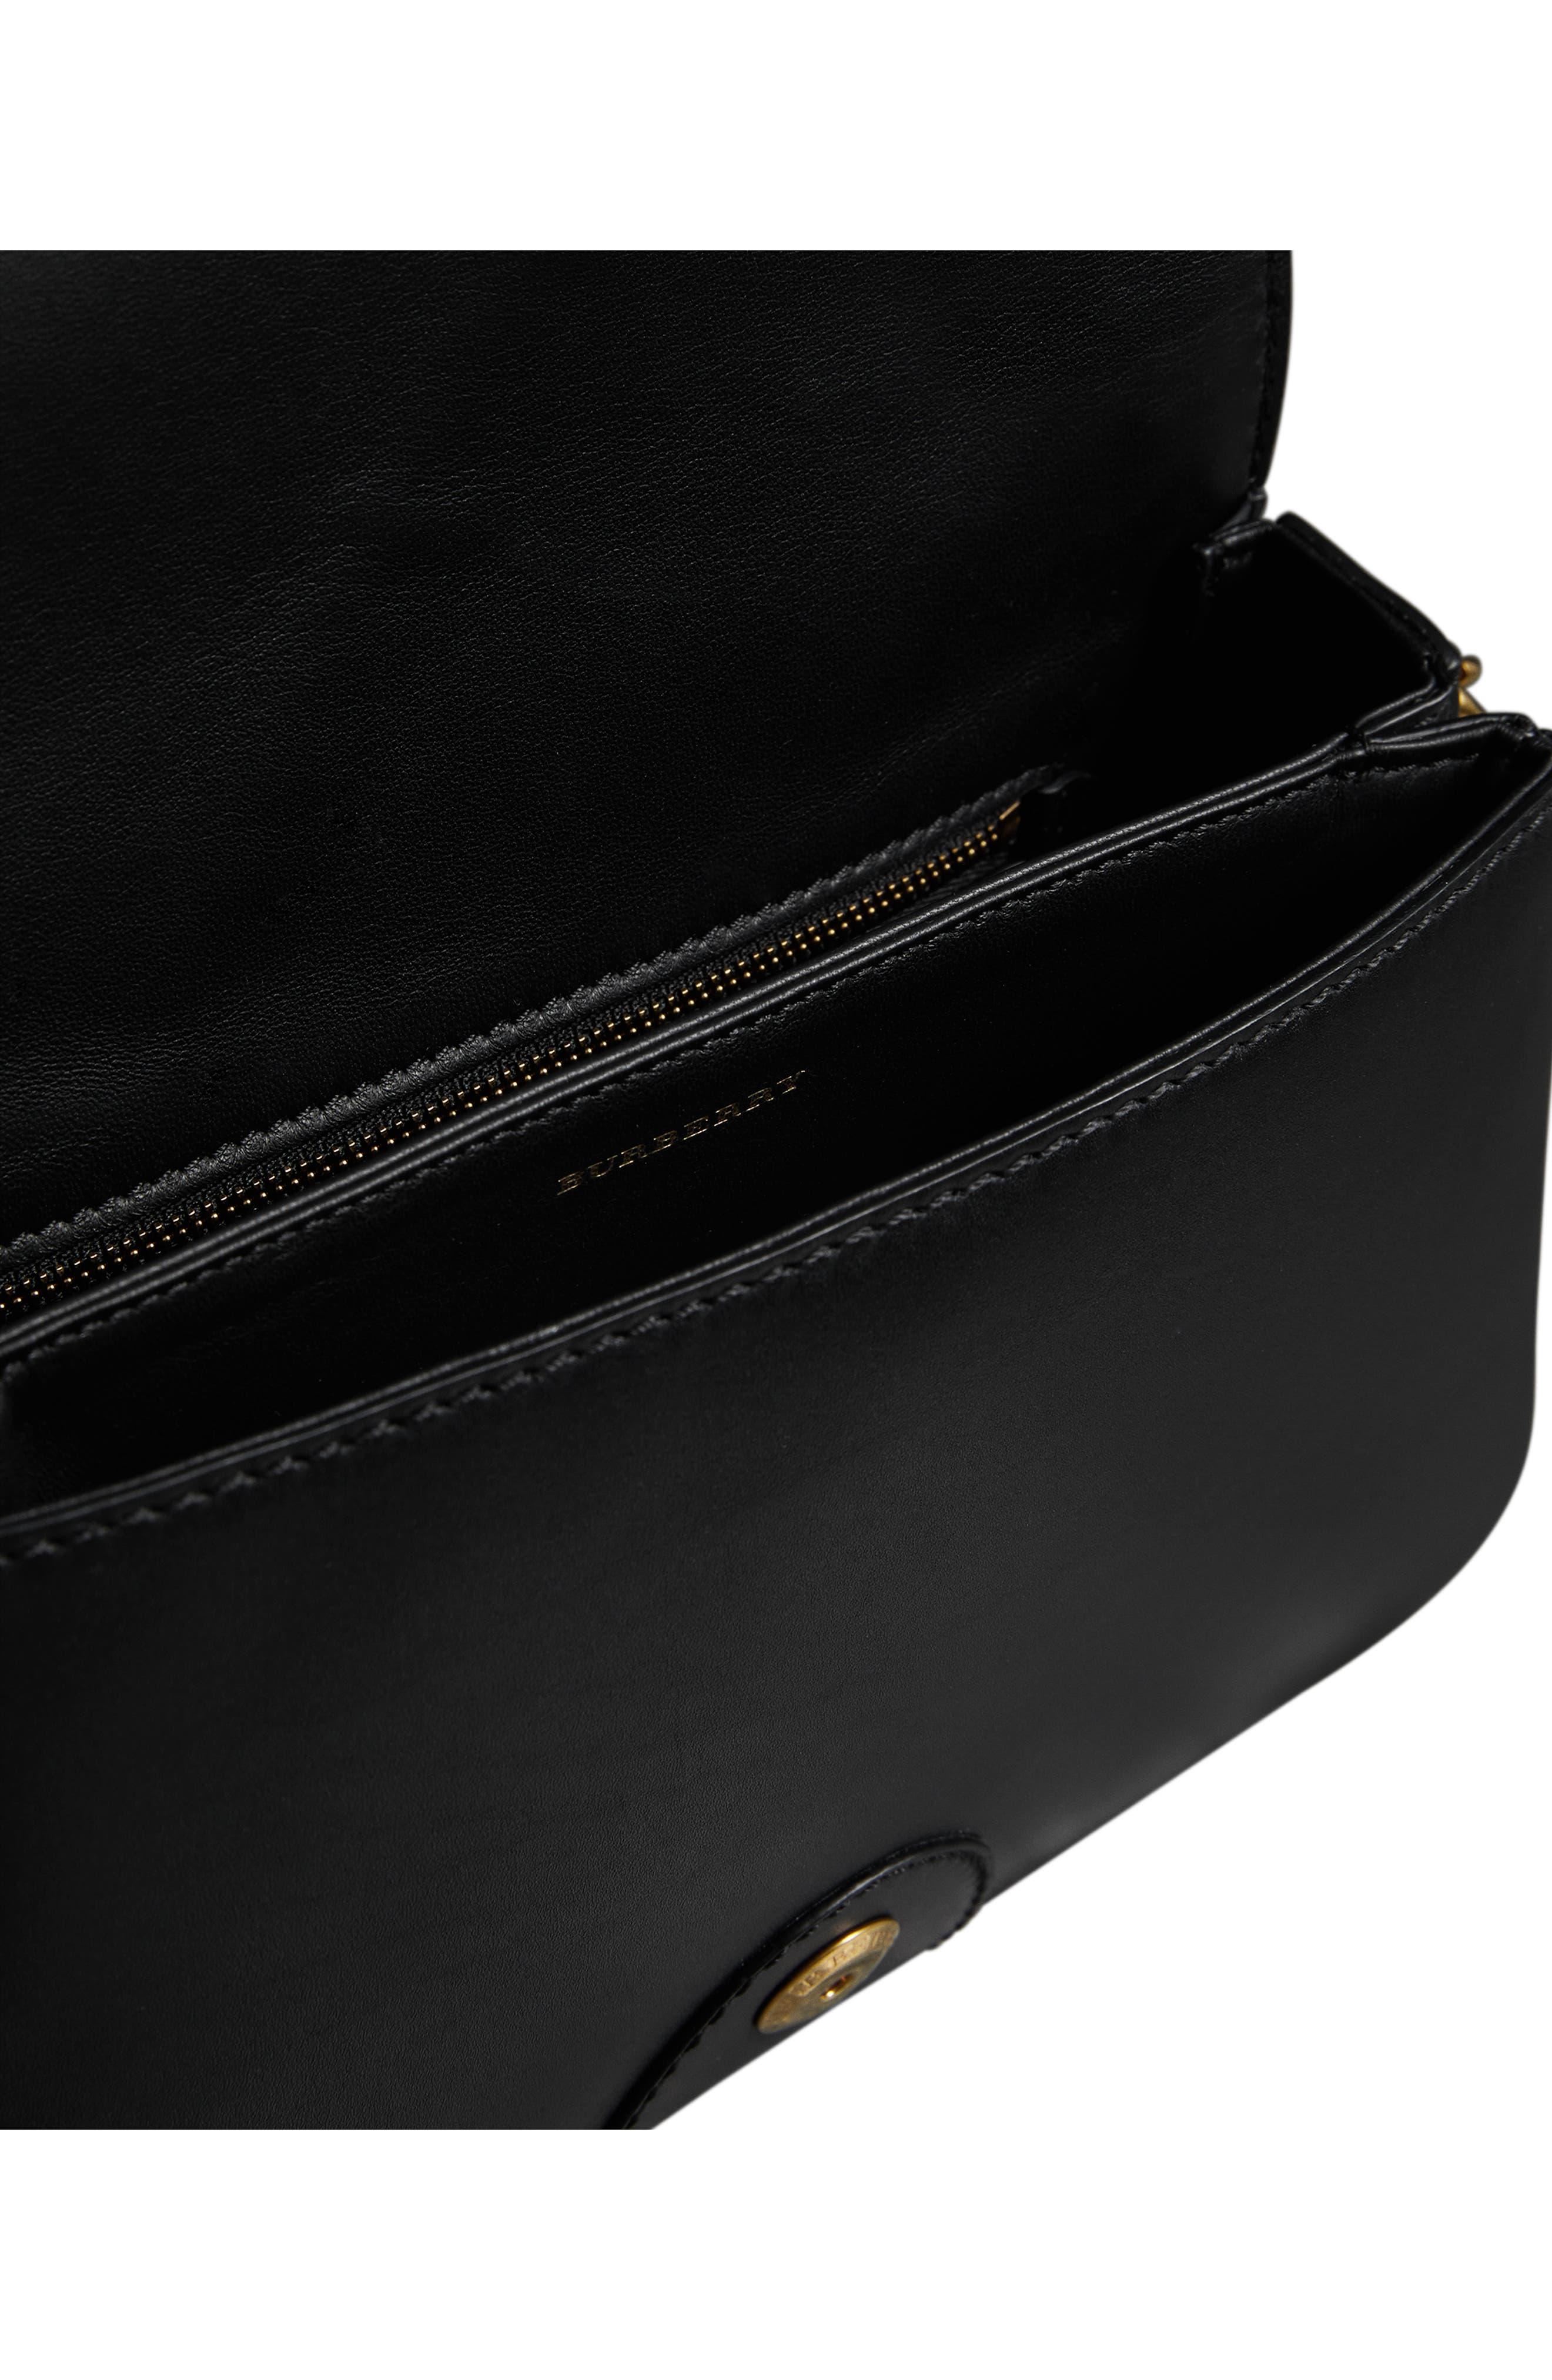 Rainbow Stripe Link Flap Leather Crossbody Bag,                             Alternate thumbnail 3, color,                             001